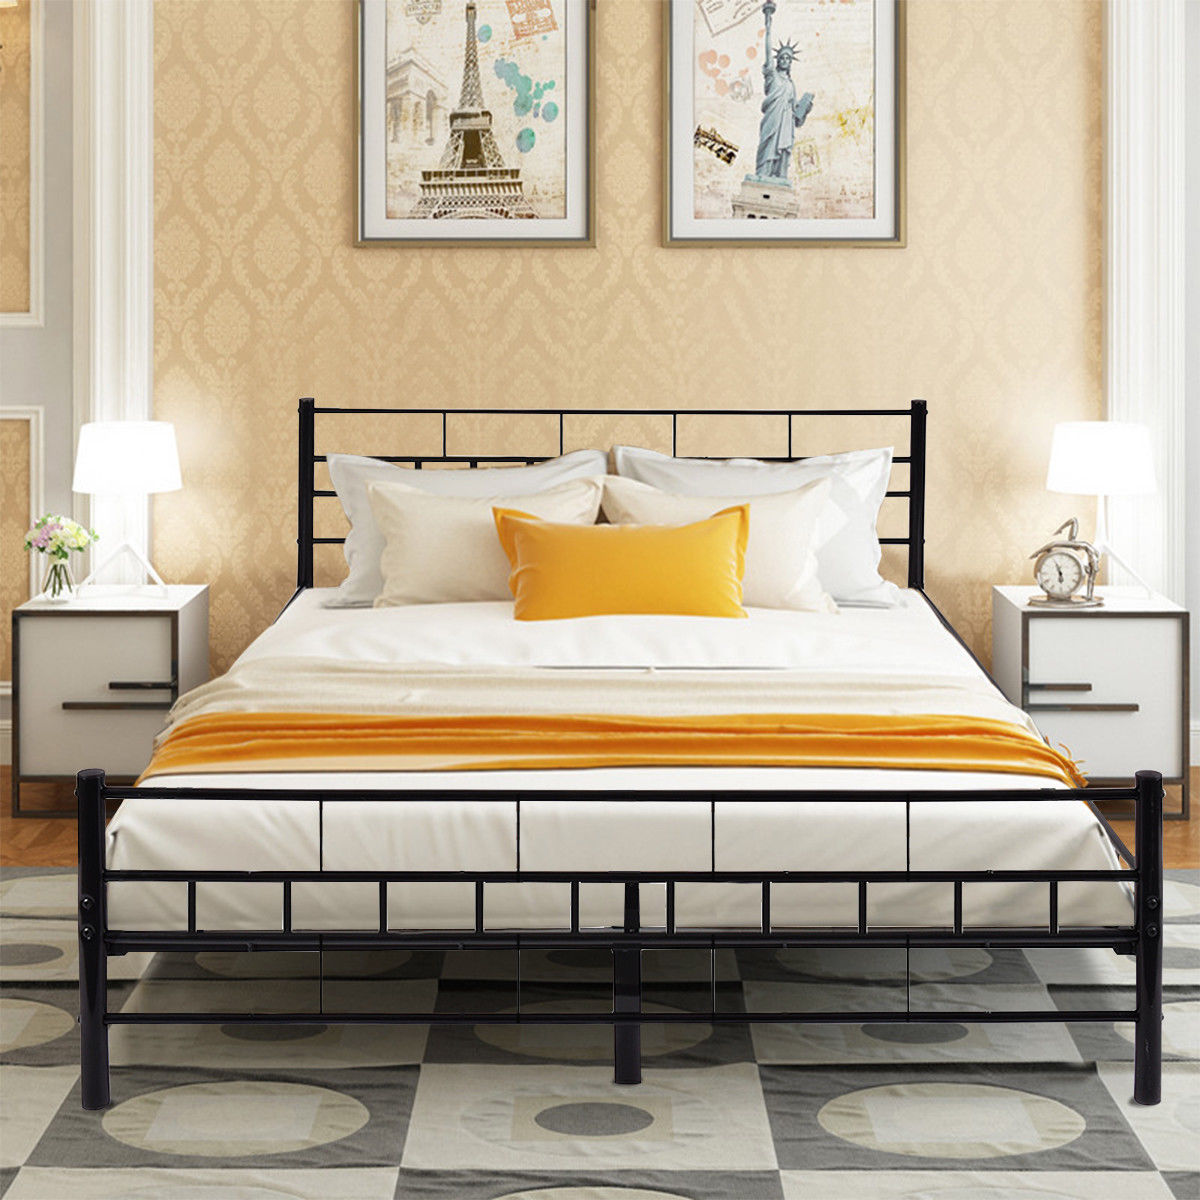 Costway Queen Size Wood Slats Bed Frame Platform Headboard Footboard